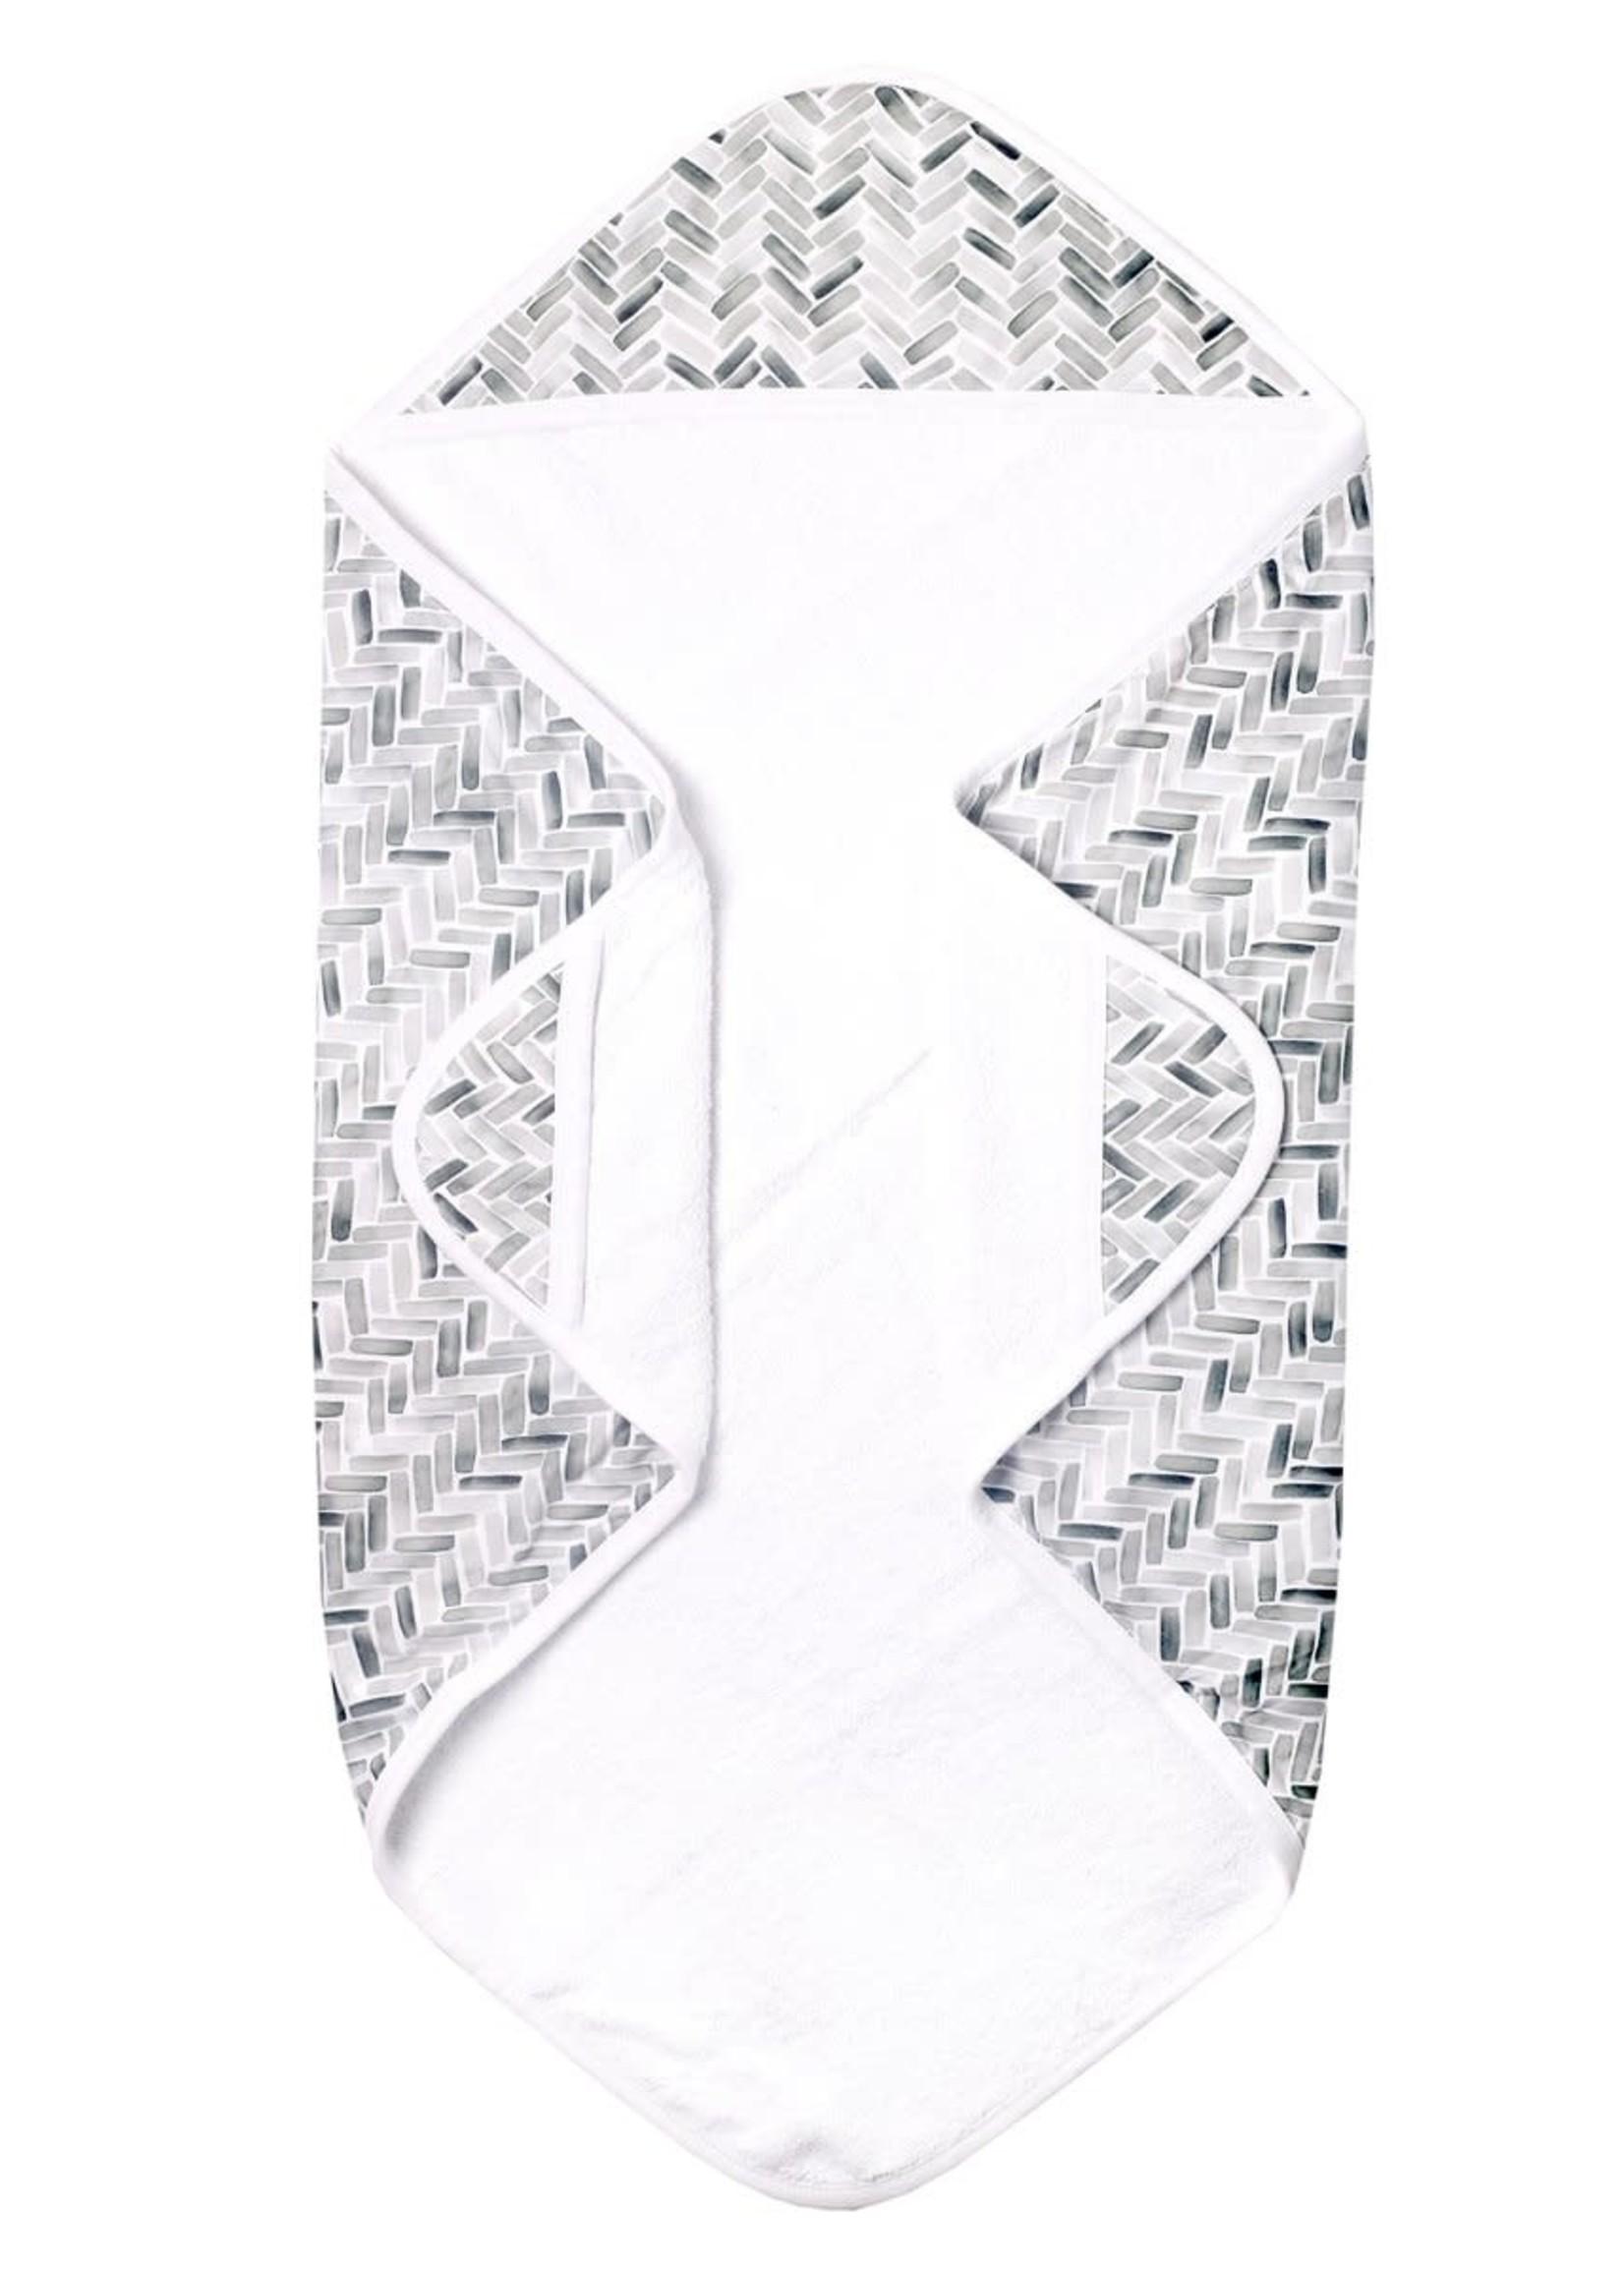 COPPER PEARL Premium Knit Hooded Towel ALTA